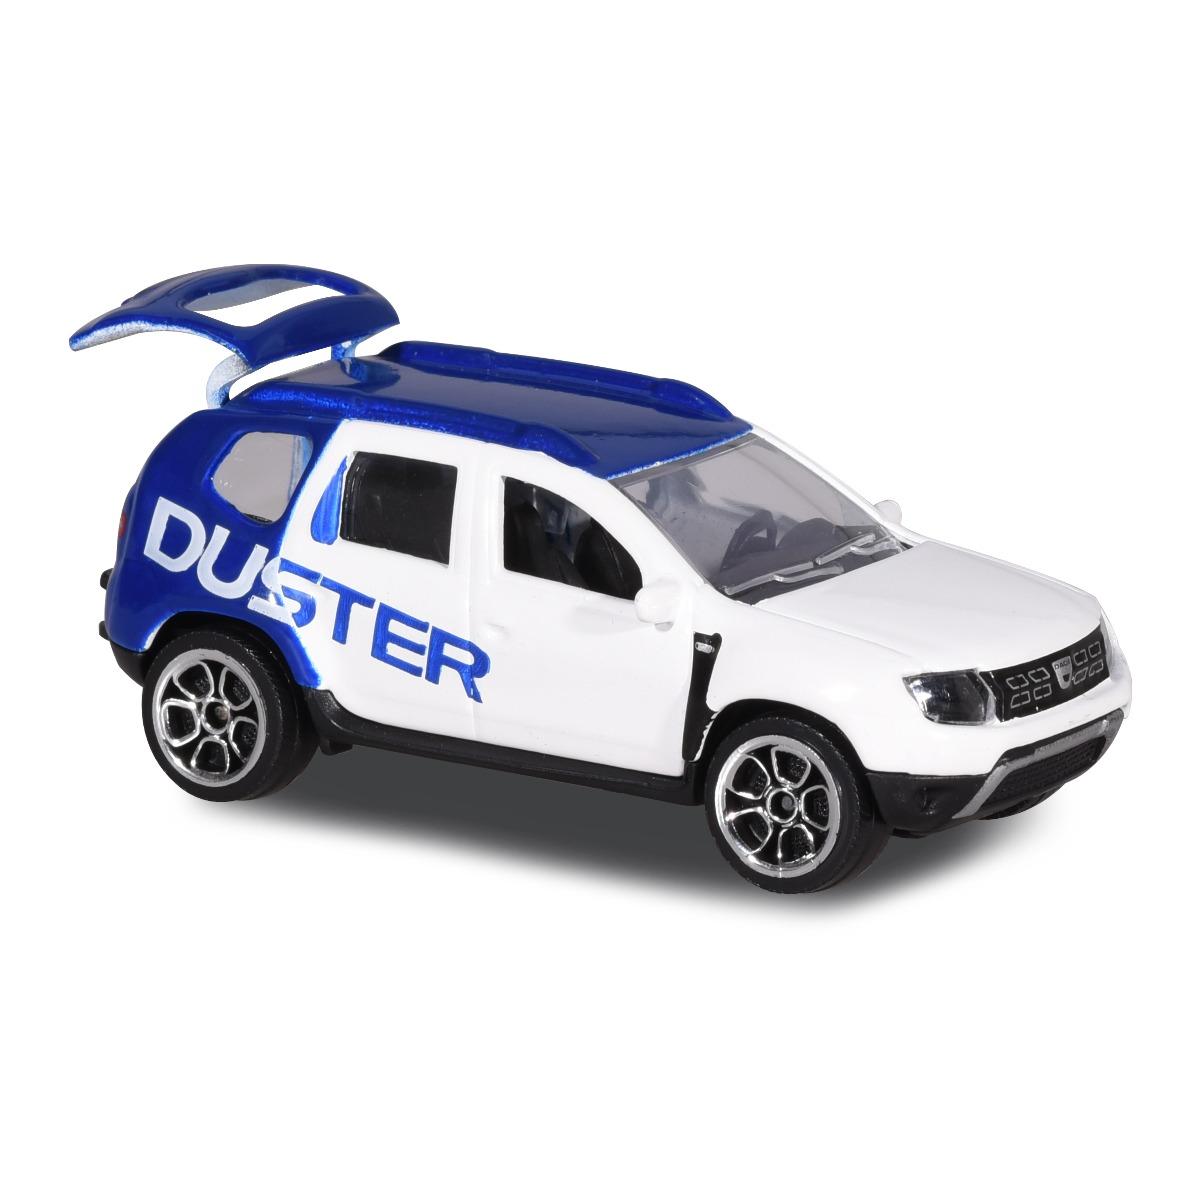 Masinuta Dacia Duster Majorette, 7.5 cm, Alb/Albastru